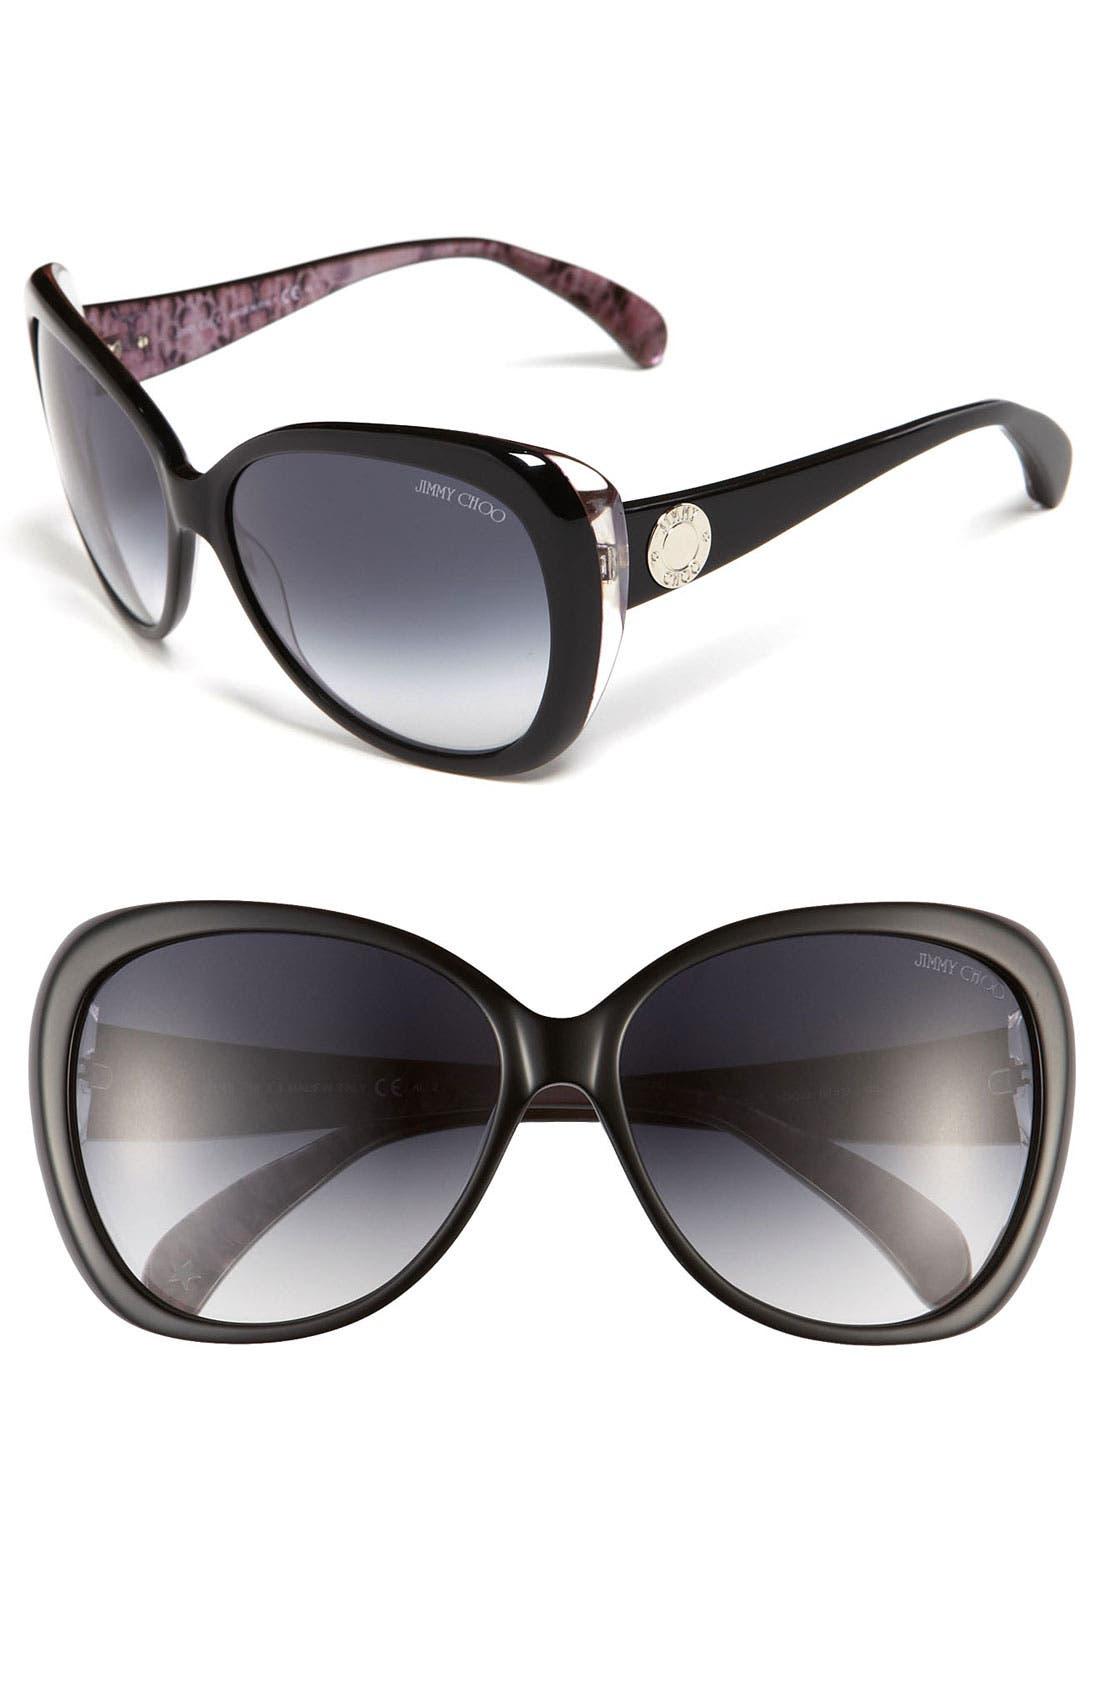 Main Image - Jimmy Choo 'Julie' Cat's Eye Sunglasses